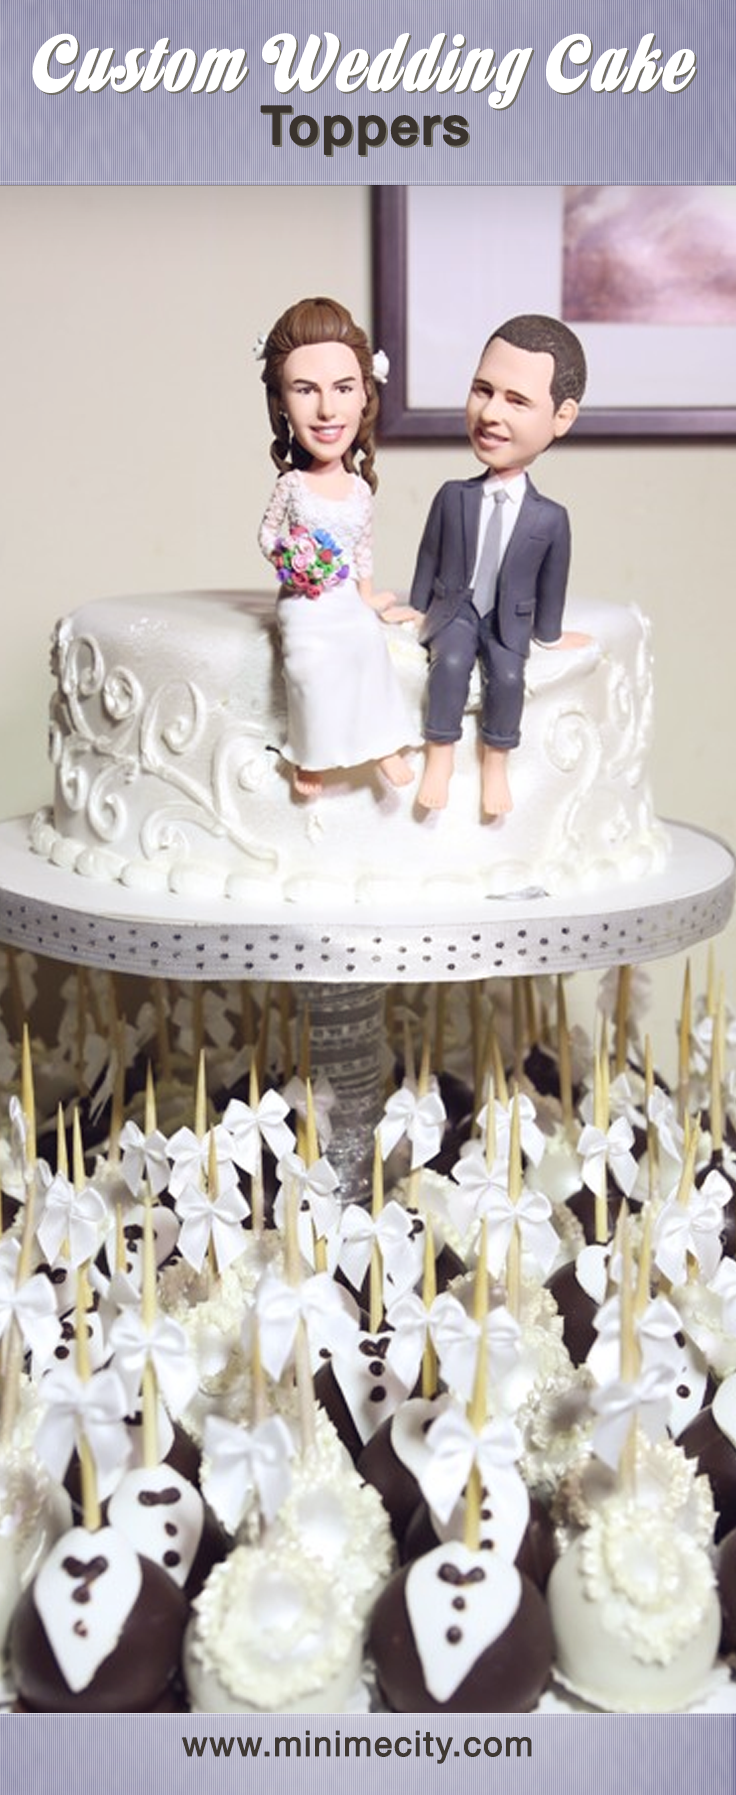 Custom Figurines From Your Photos!   Custom cake, Cake and Weddings